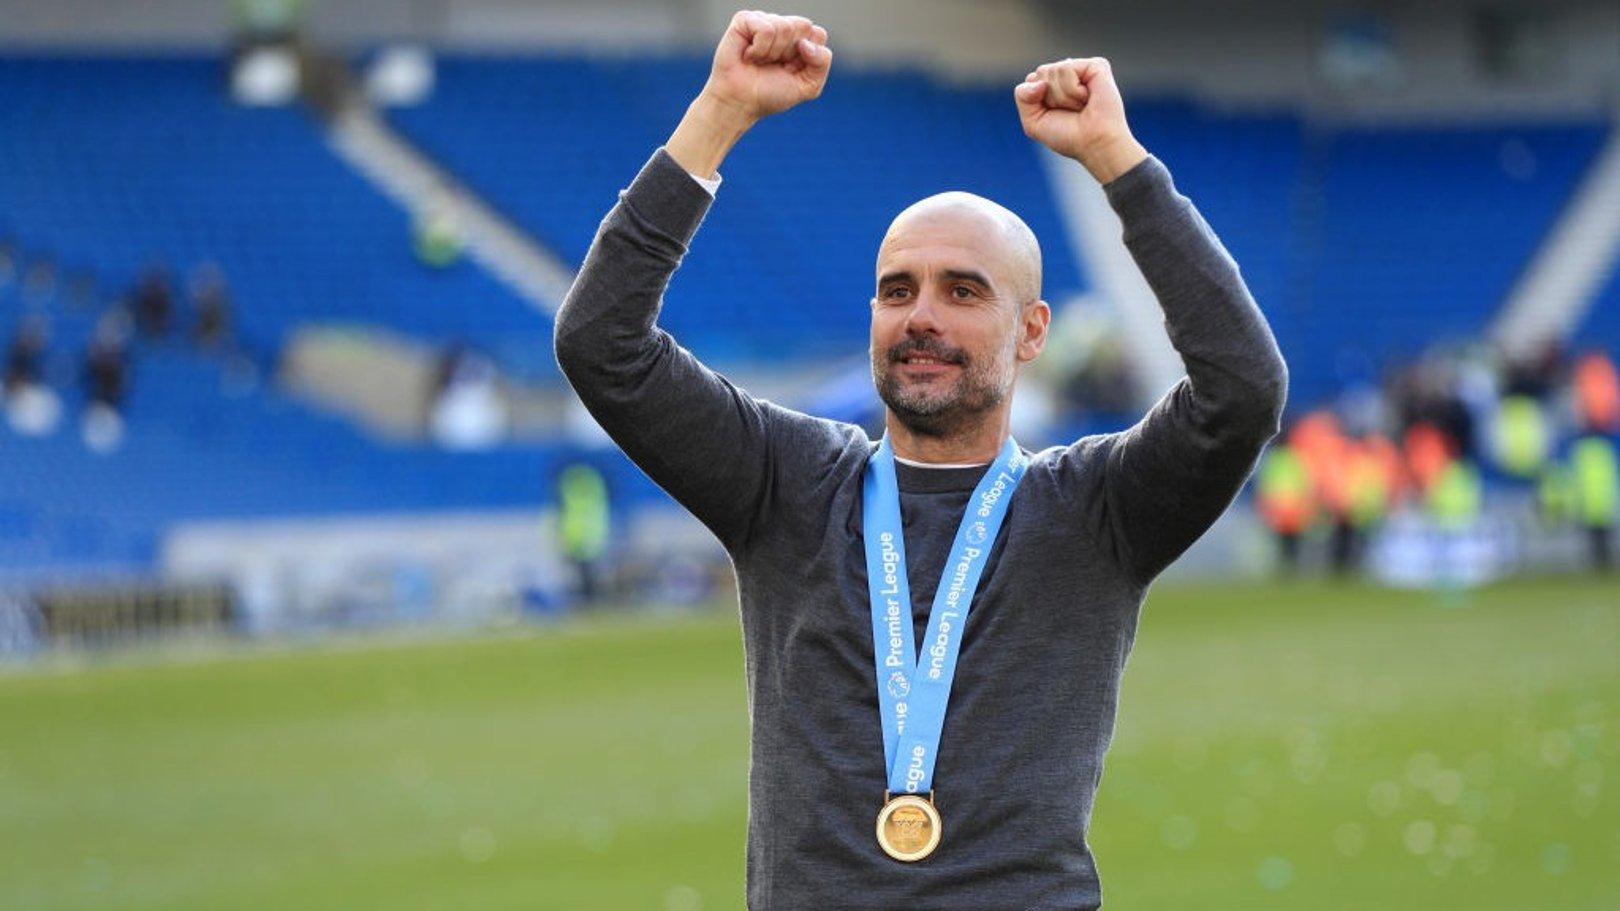 JUST CHAMPION: Pep Guardiola salutes the City fans at Brighton.